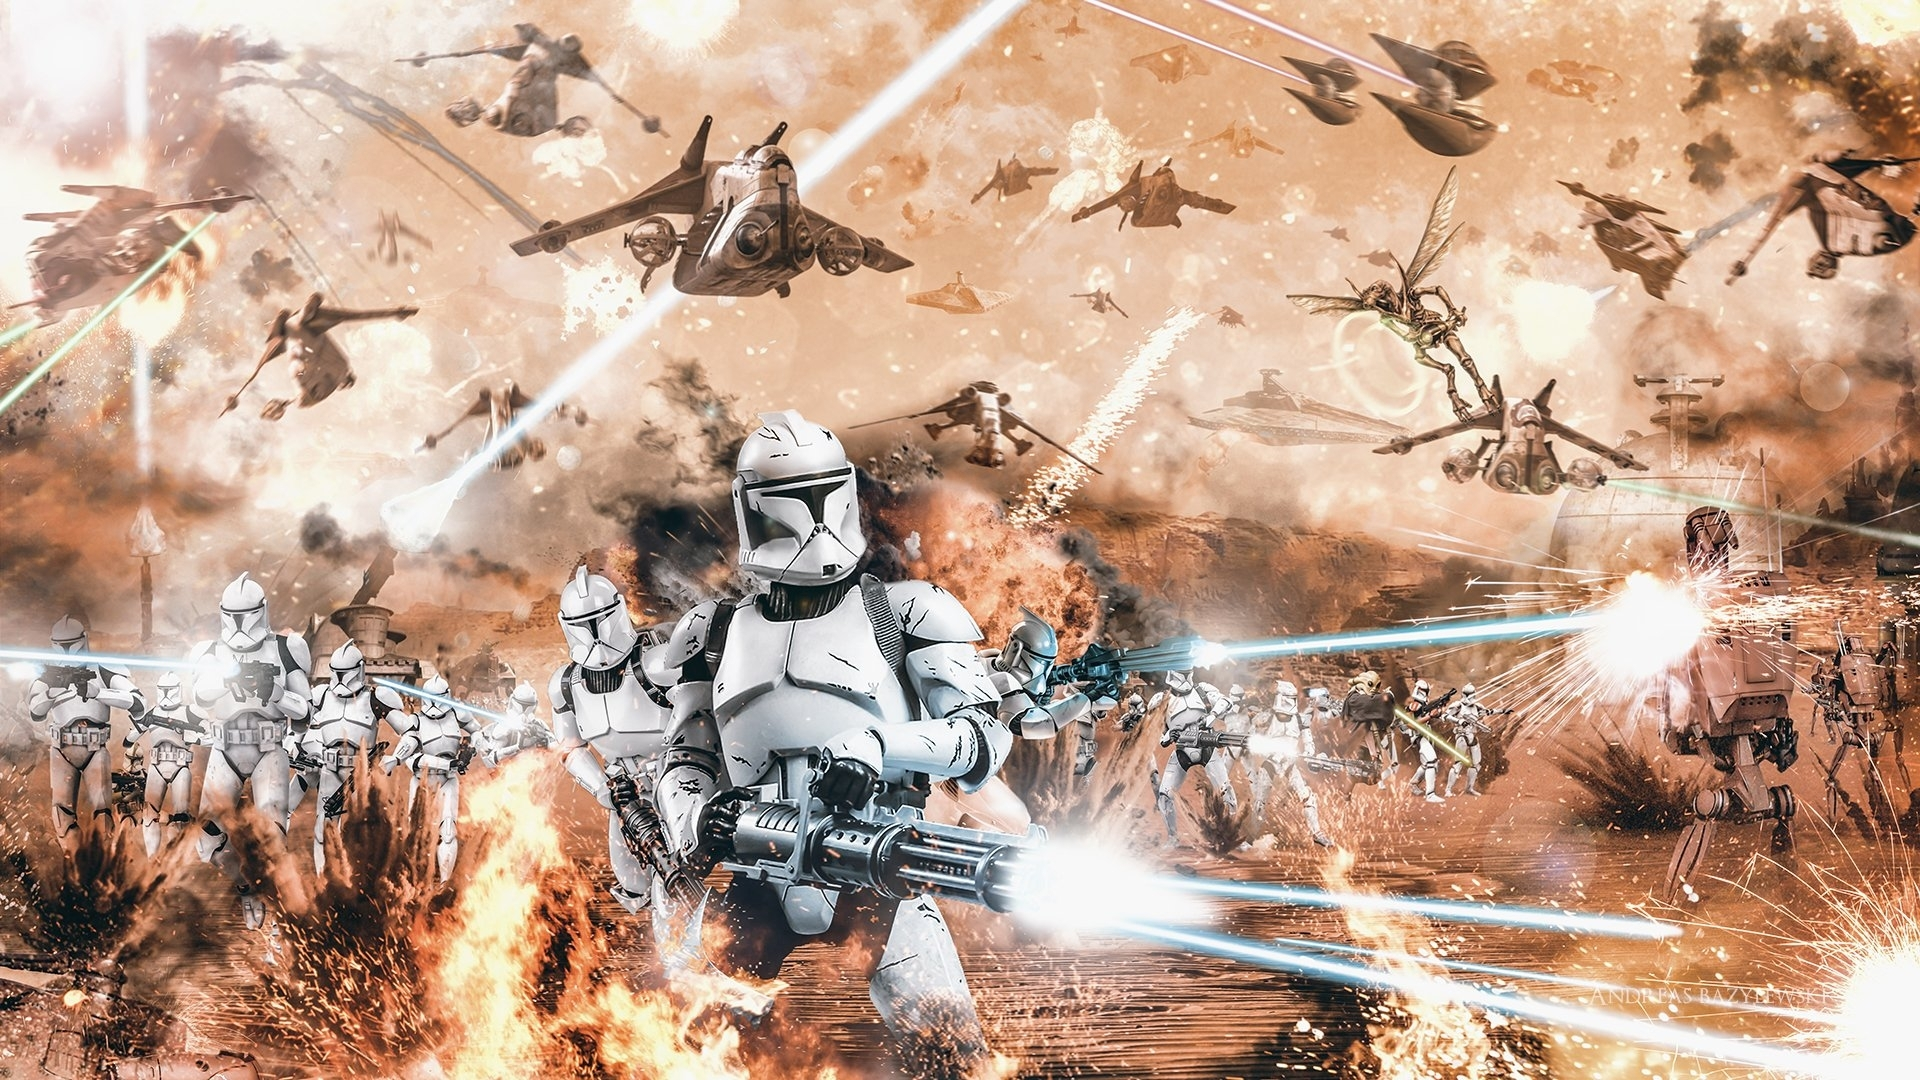 attack of the clones full hd fond d'écran and arrière-plan